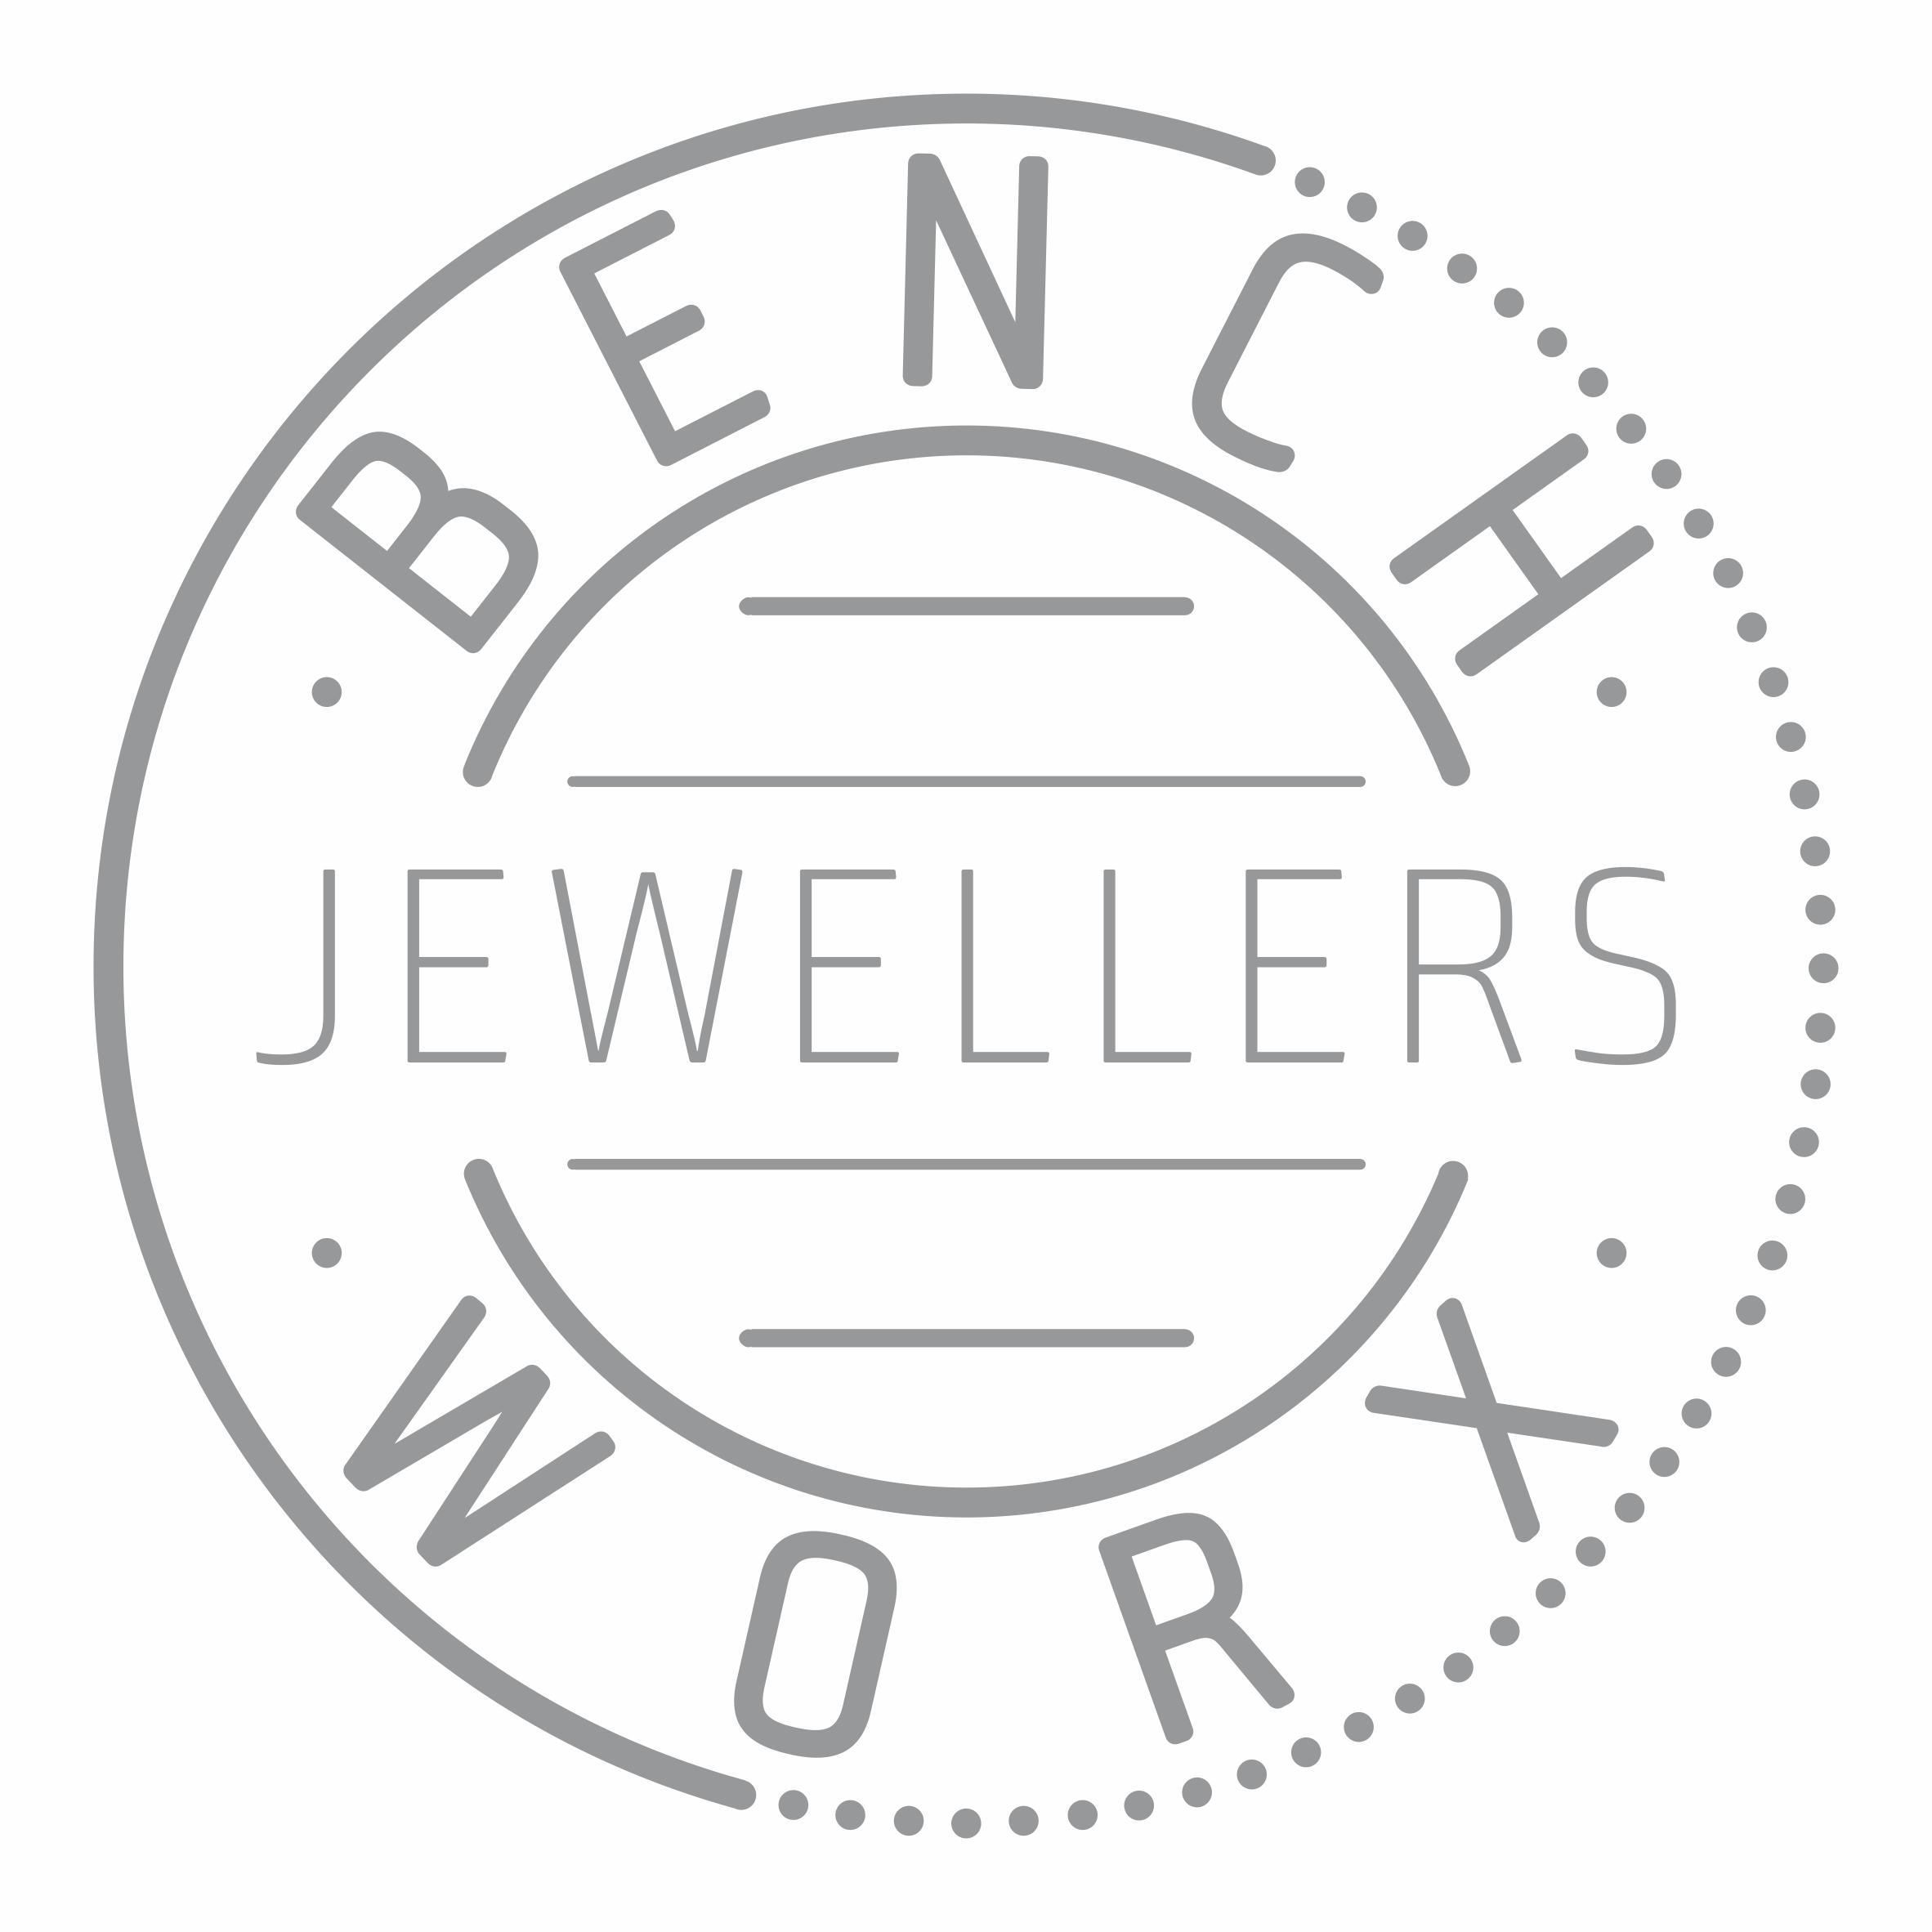 BenchWorx Jewellers Logo design – Final